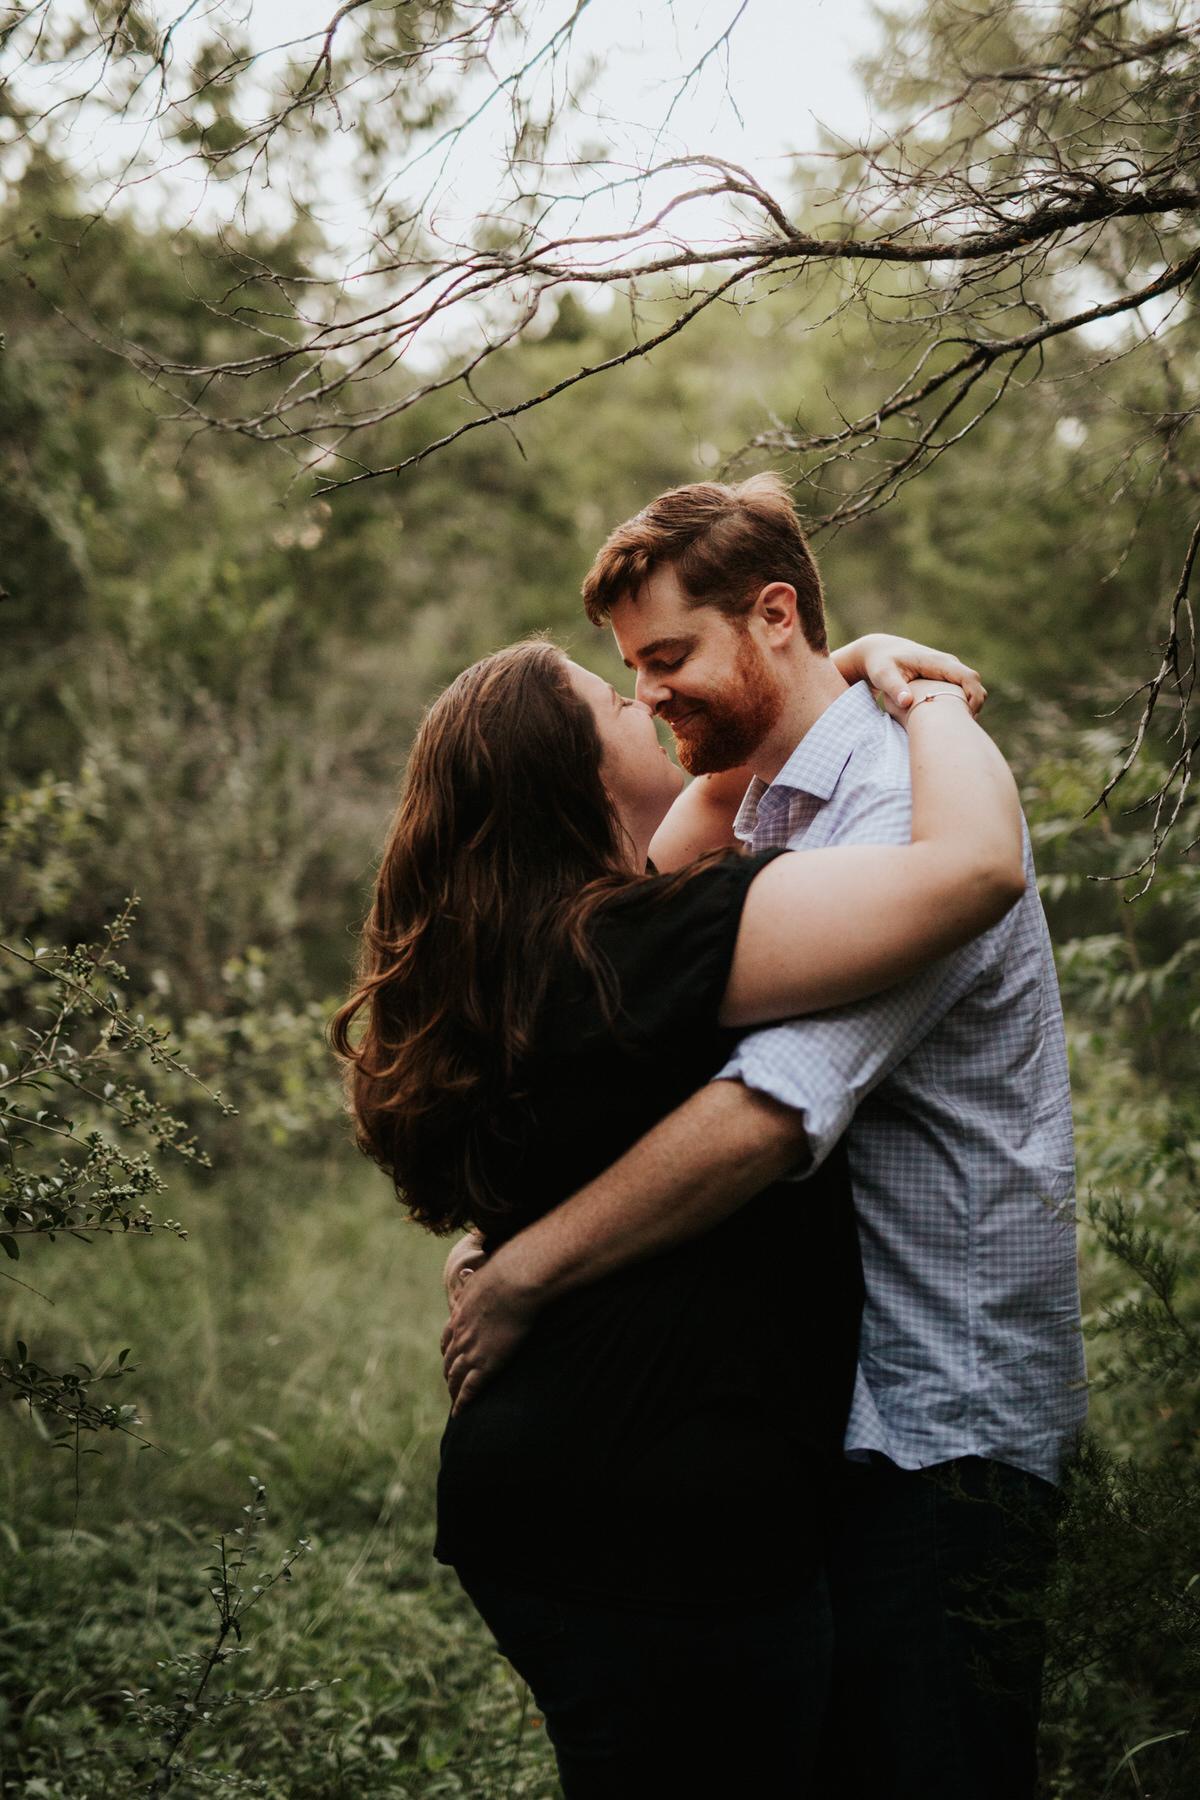 Happy couple hugging